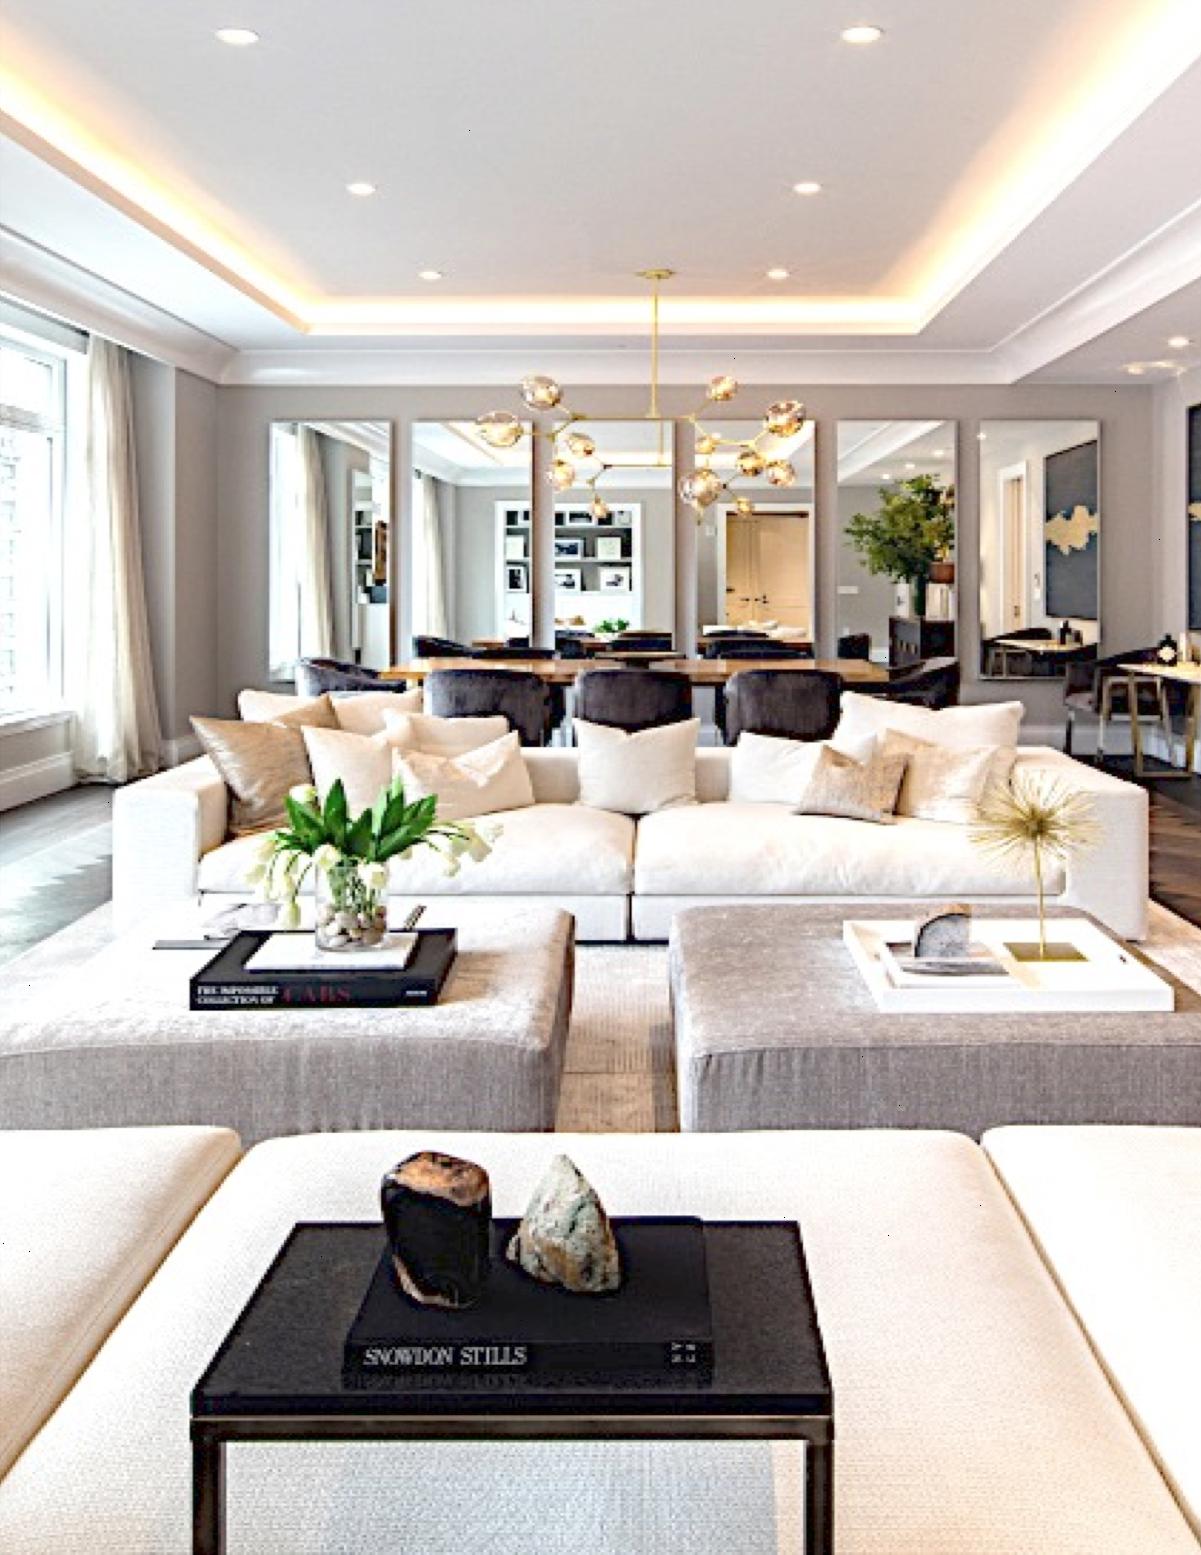 Usa Contemporary Home Decor And Mid Century Modern Lighting Ideas From Delightfull Visi Luxury Living Room Modern Interior Design Contemporary Home Decor